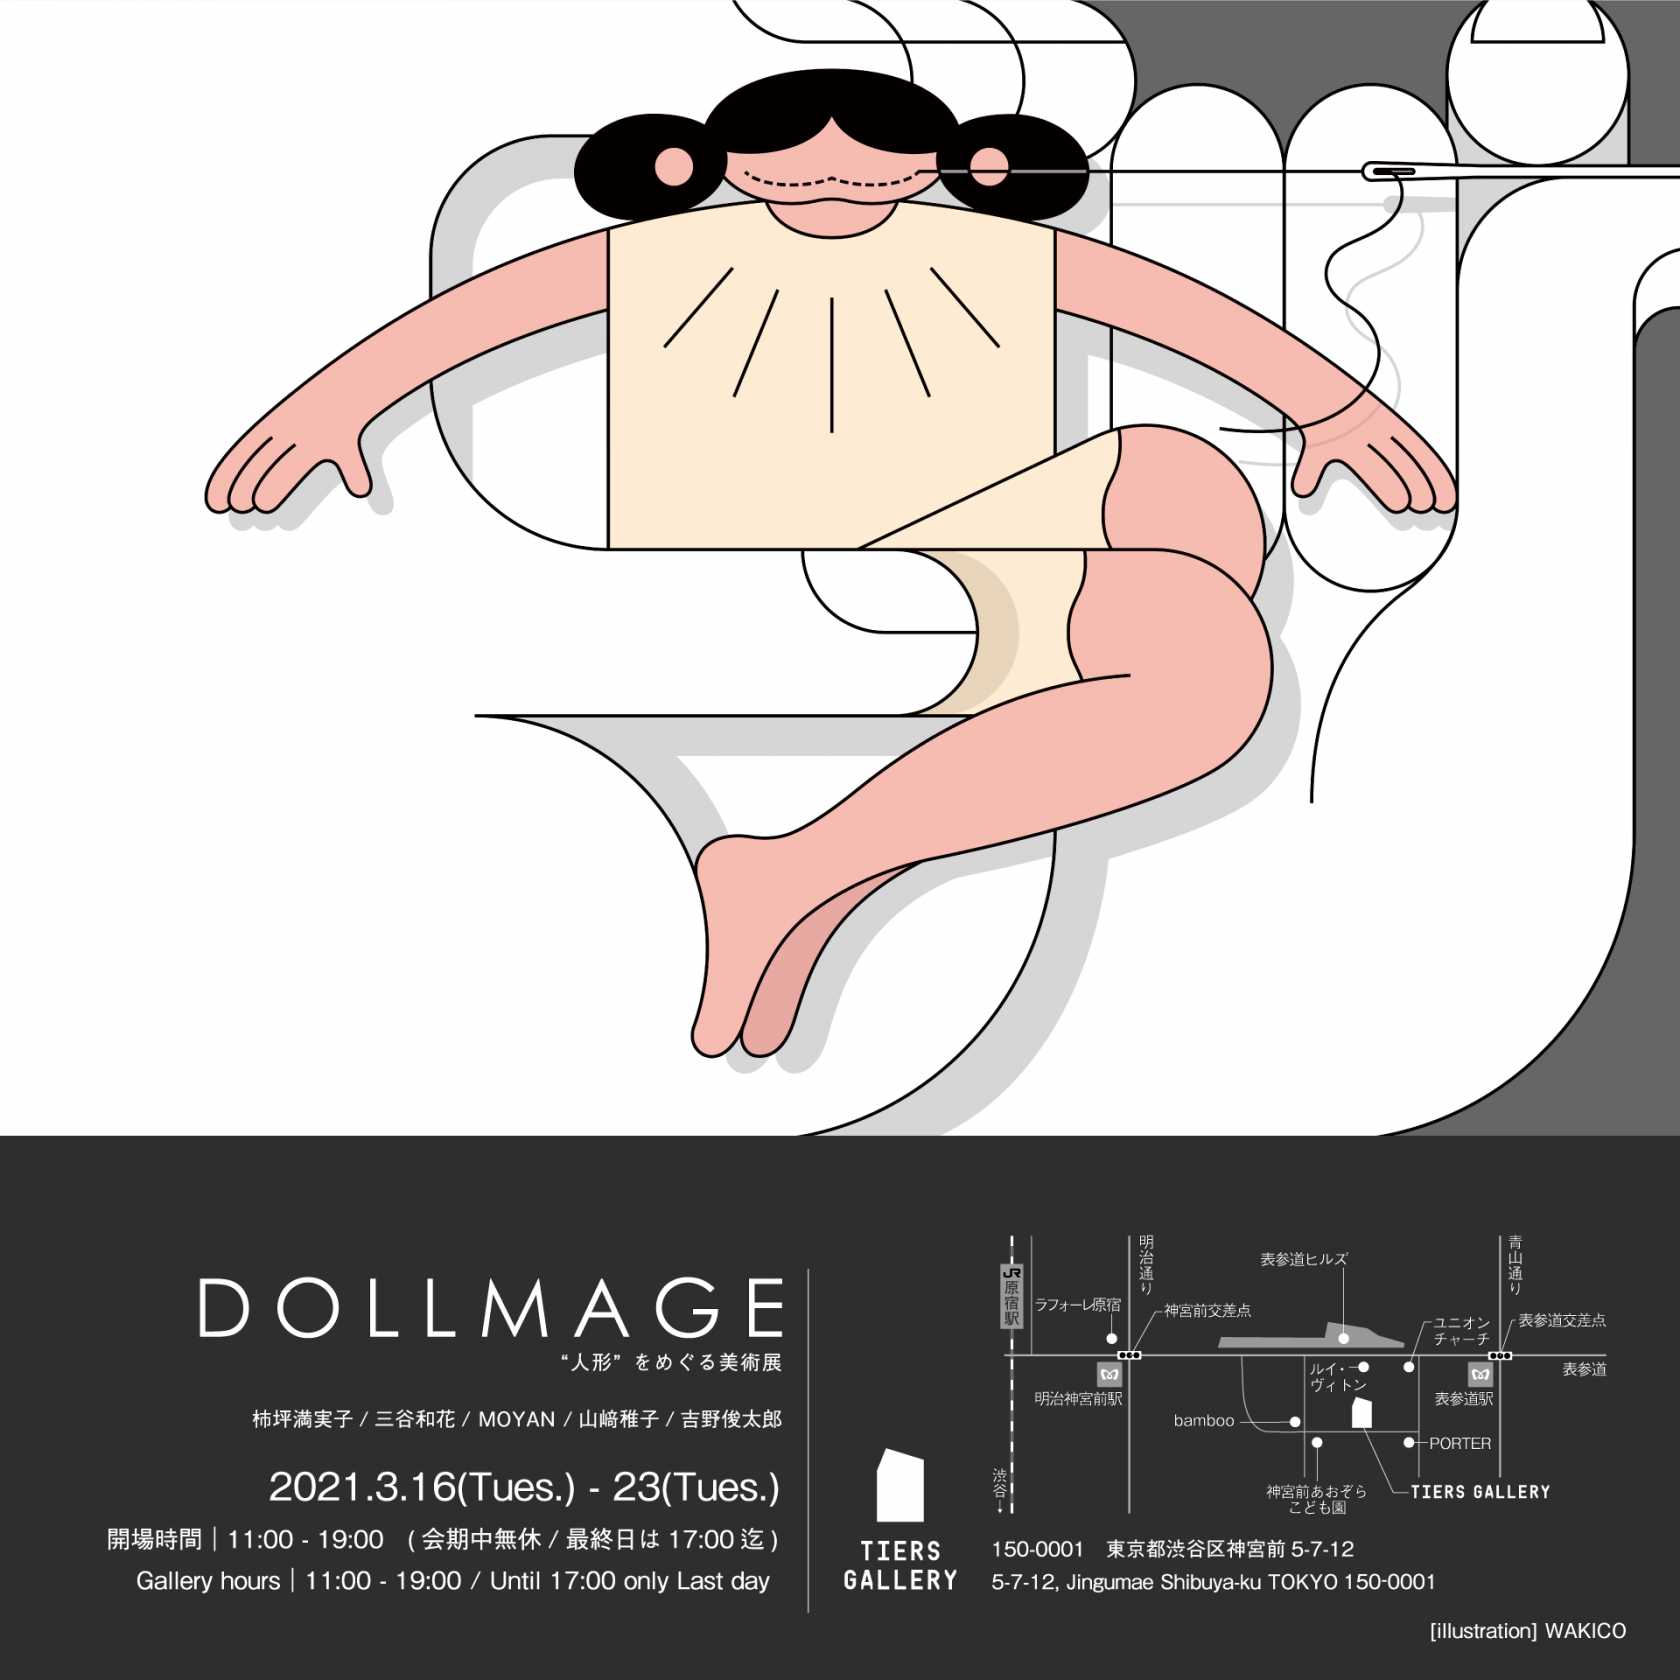 "「DOLLMAGE」""人形""を巡る美術展"